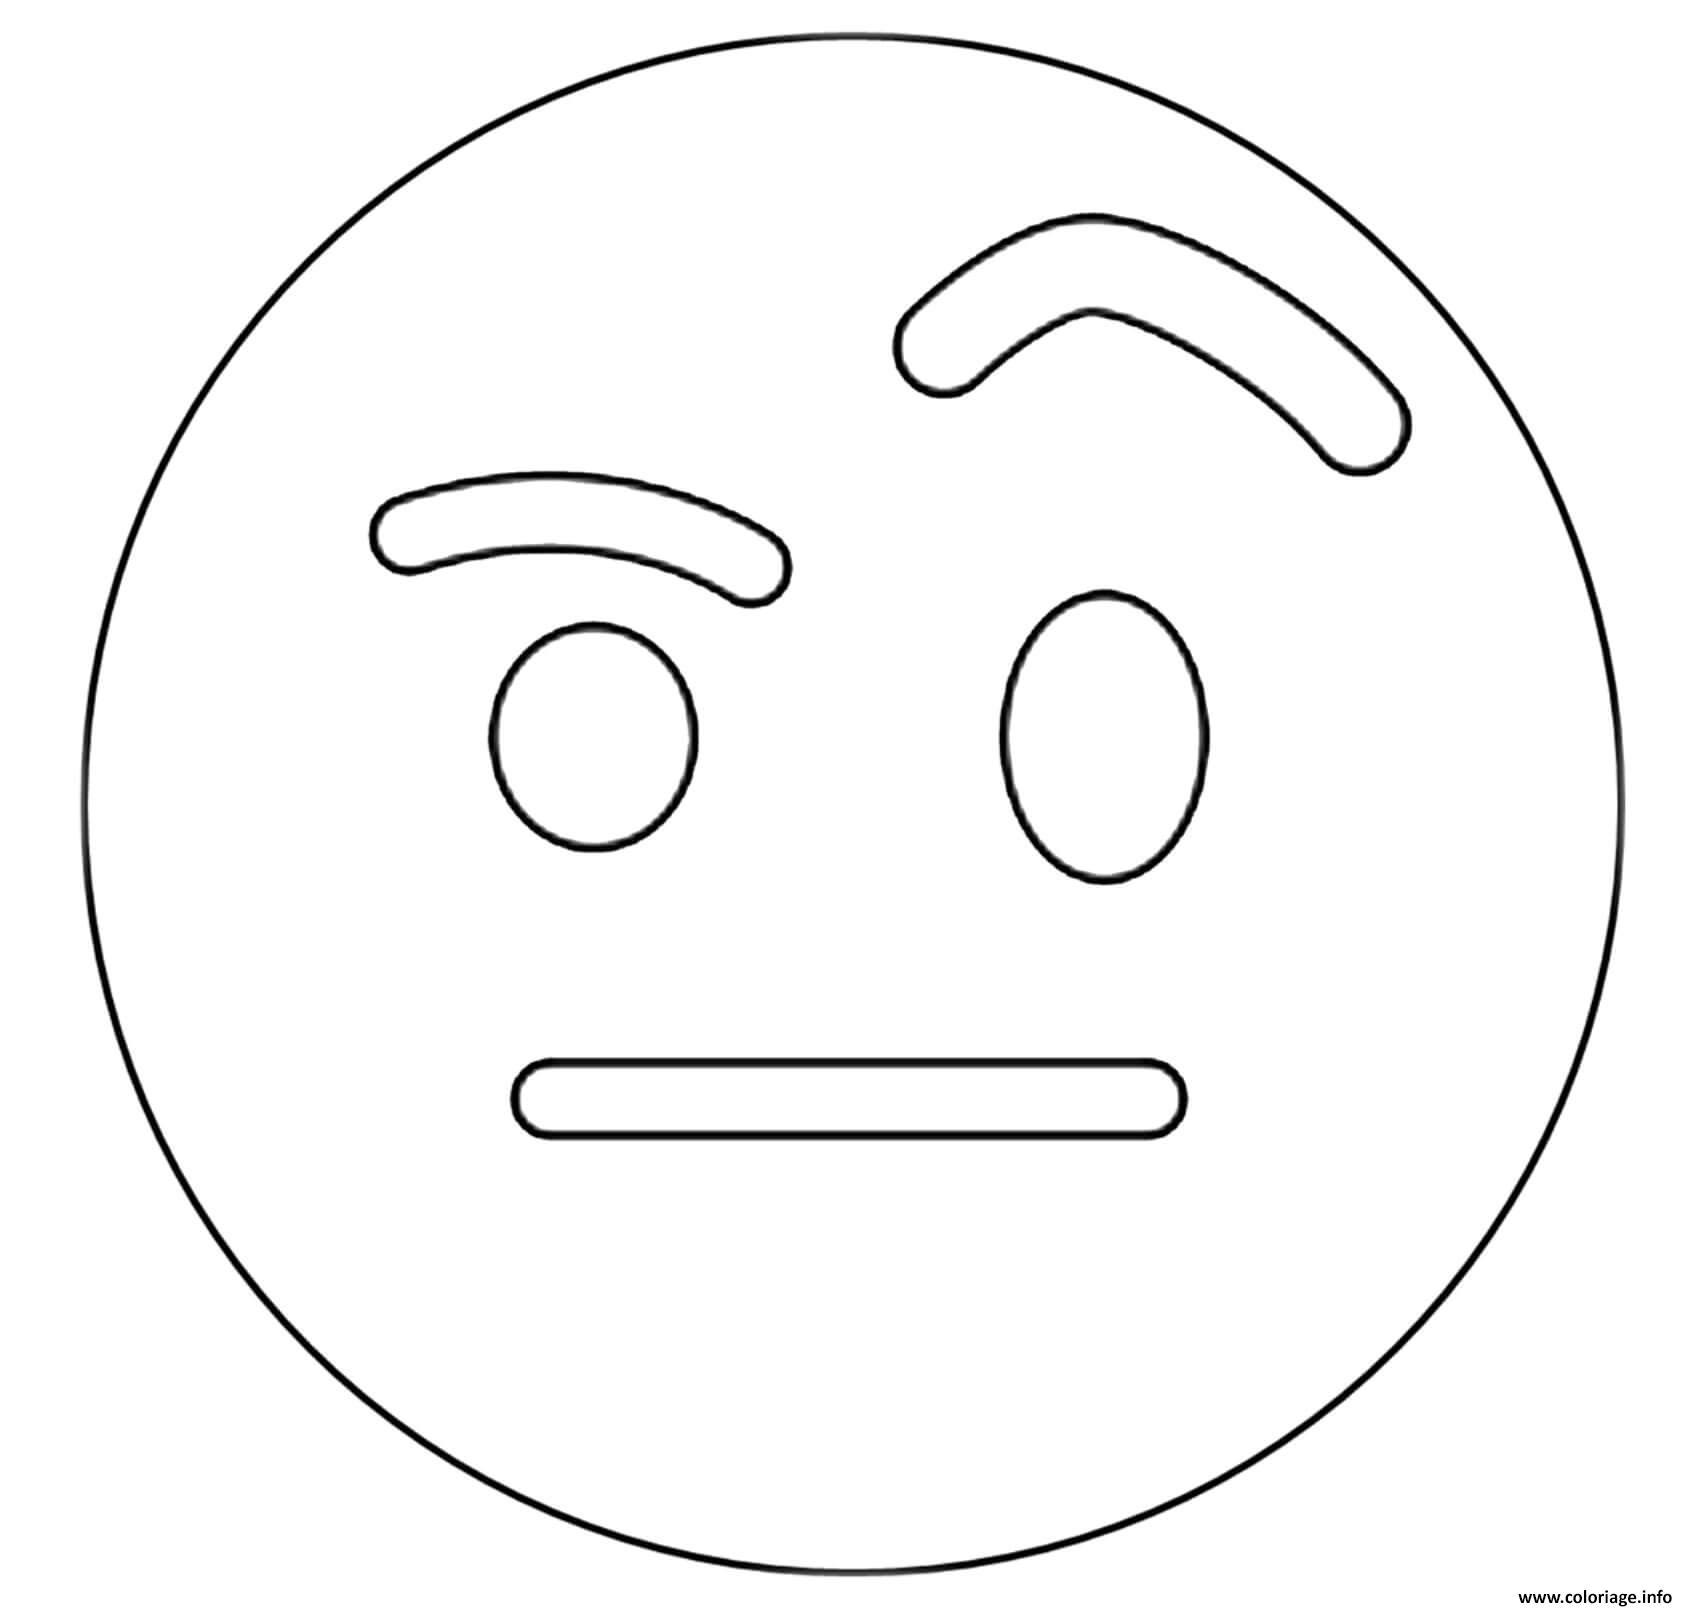 Dessin Twitter Raised Eyebrow Emoji Coloriage Gratuit à Imprimer